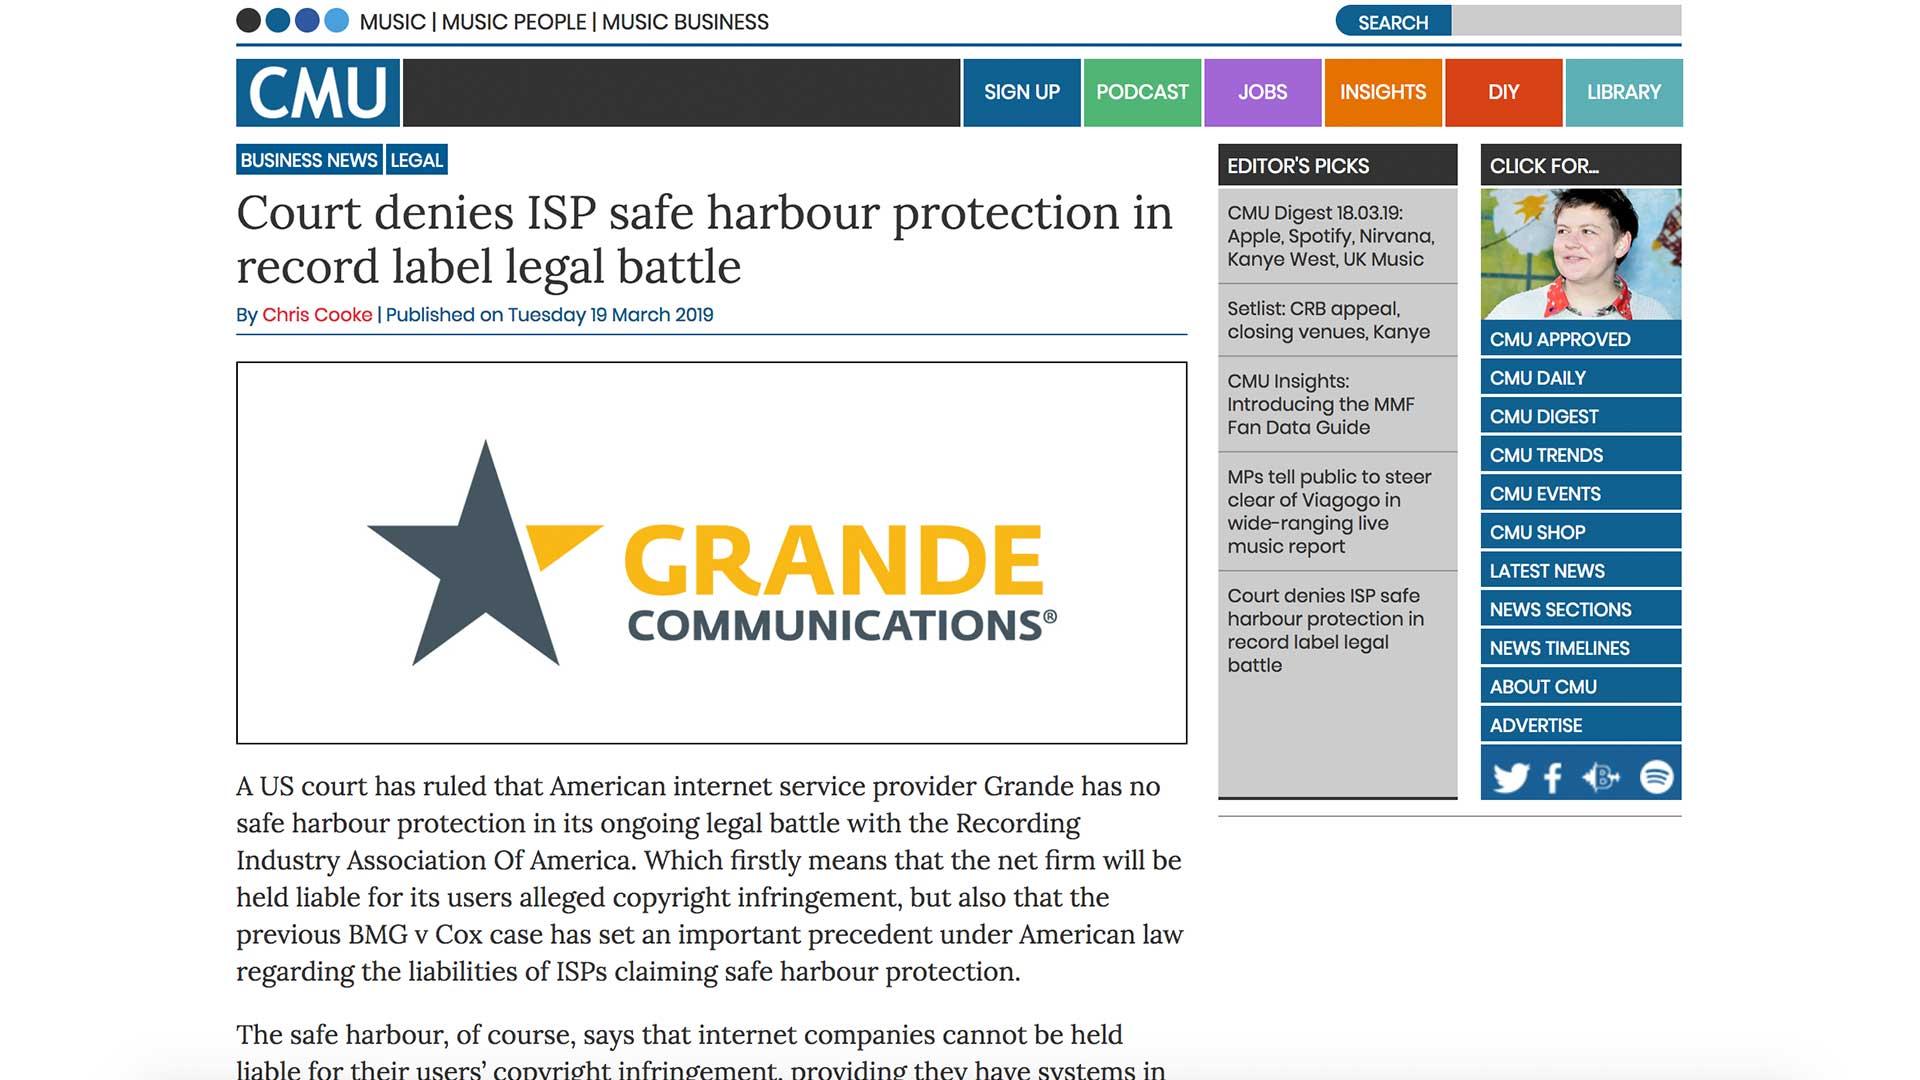 Fairness Rocks News Court denies ISP safe harbour protection in record label legal battle